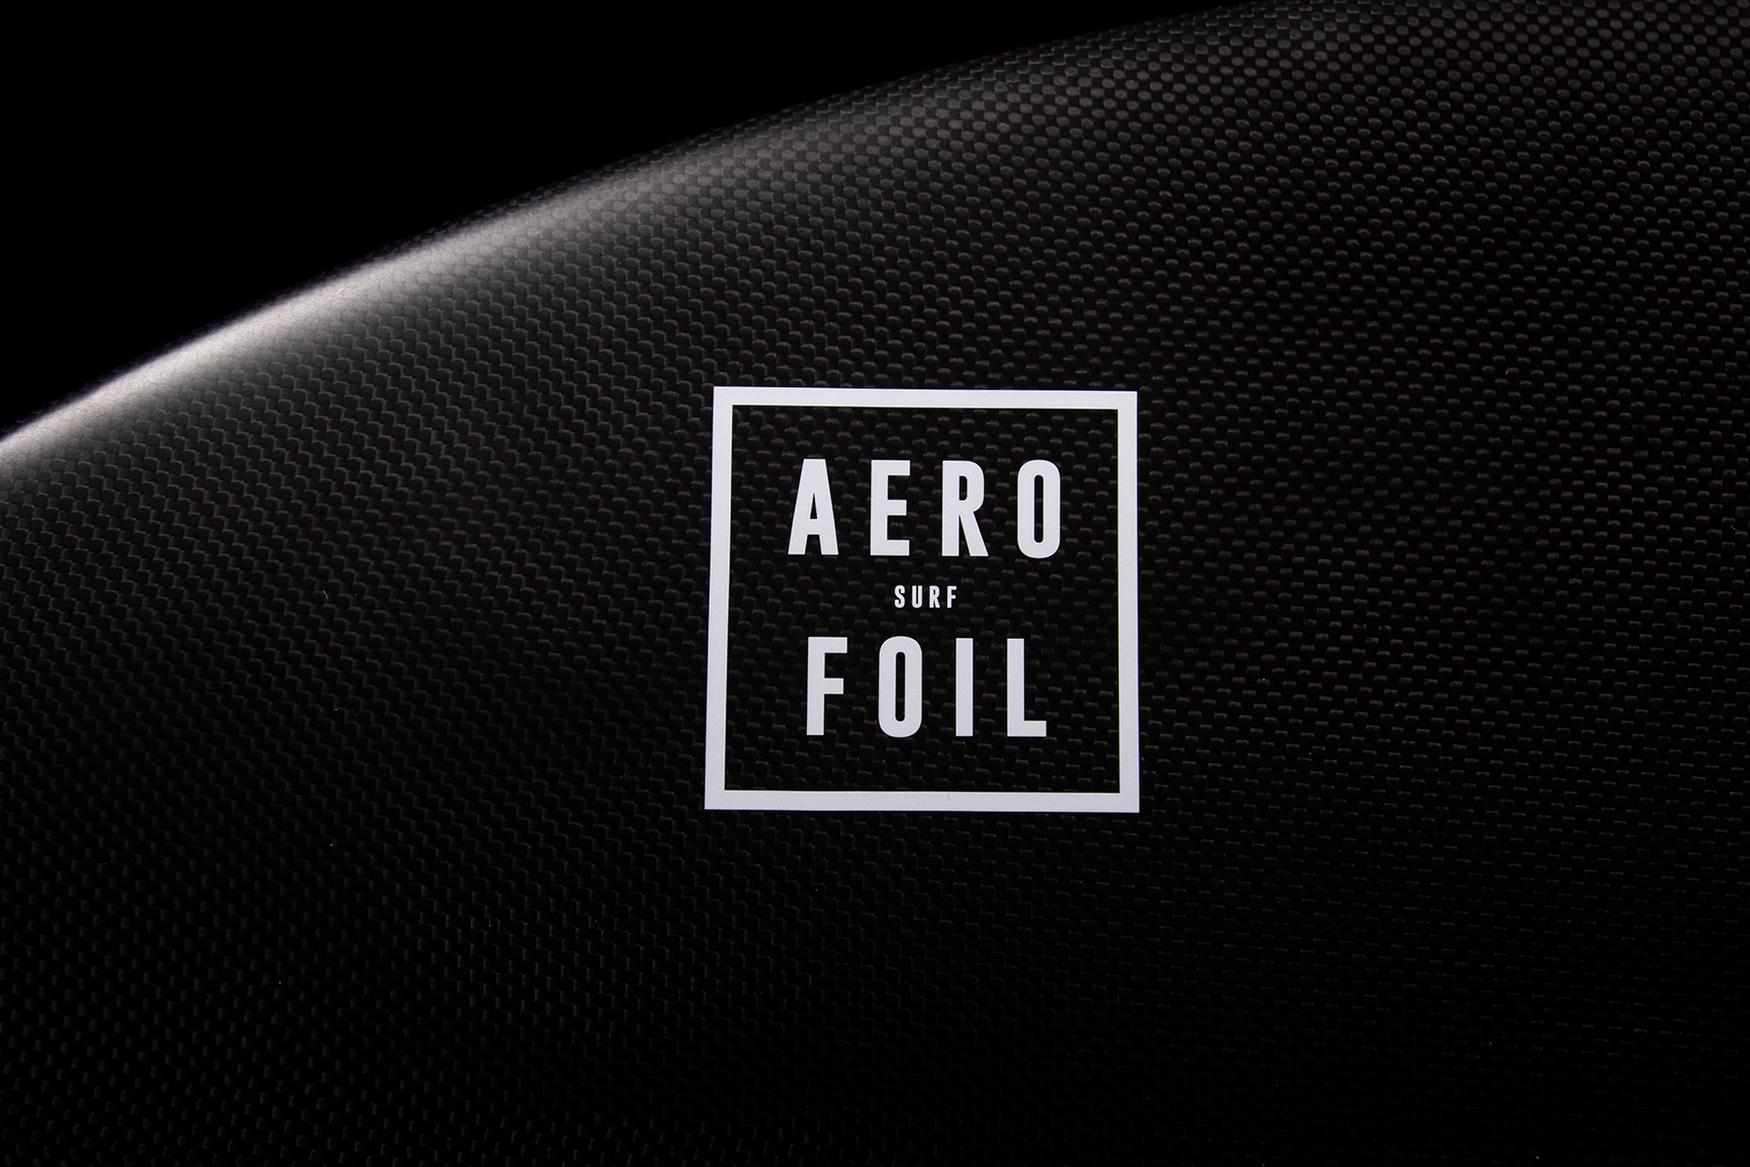 Aero Foil 2000 Short Fuselage